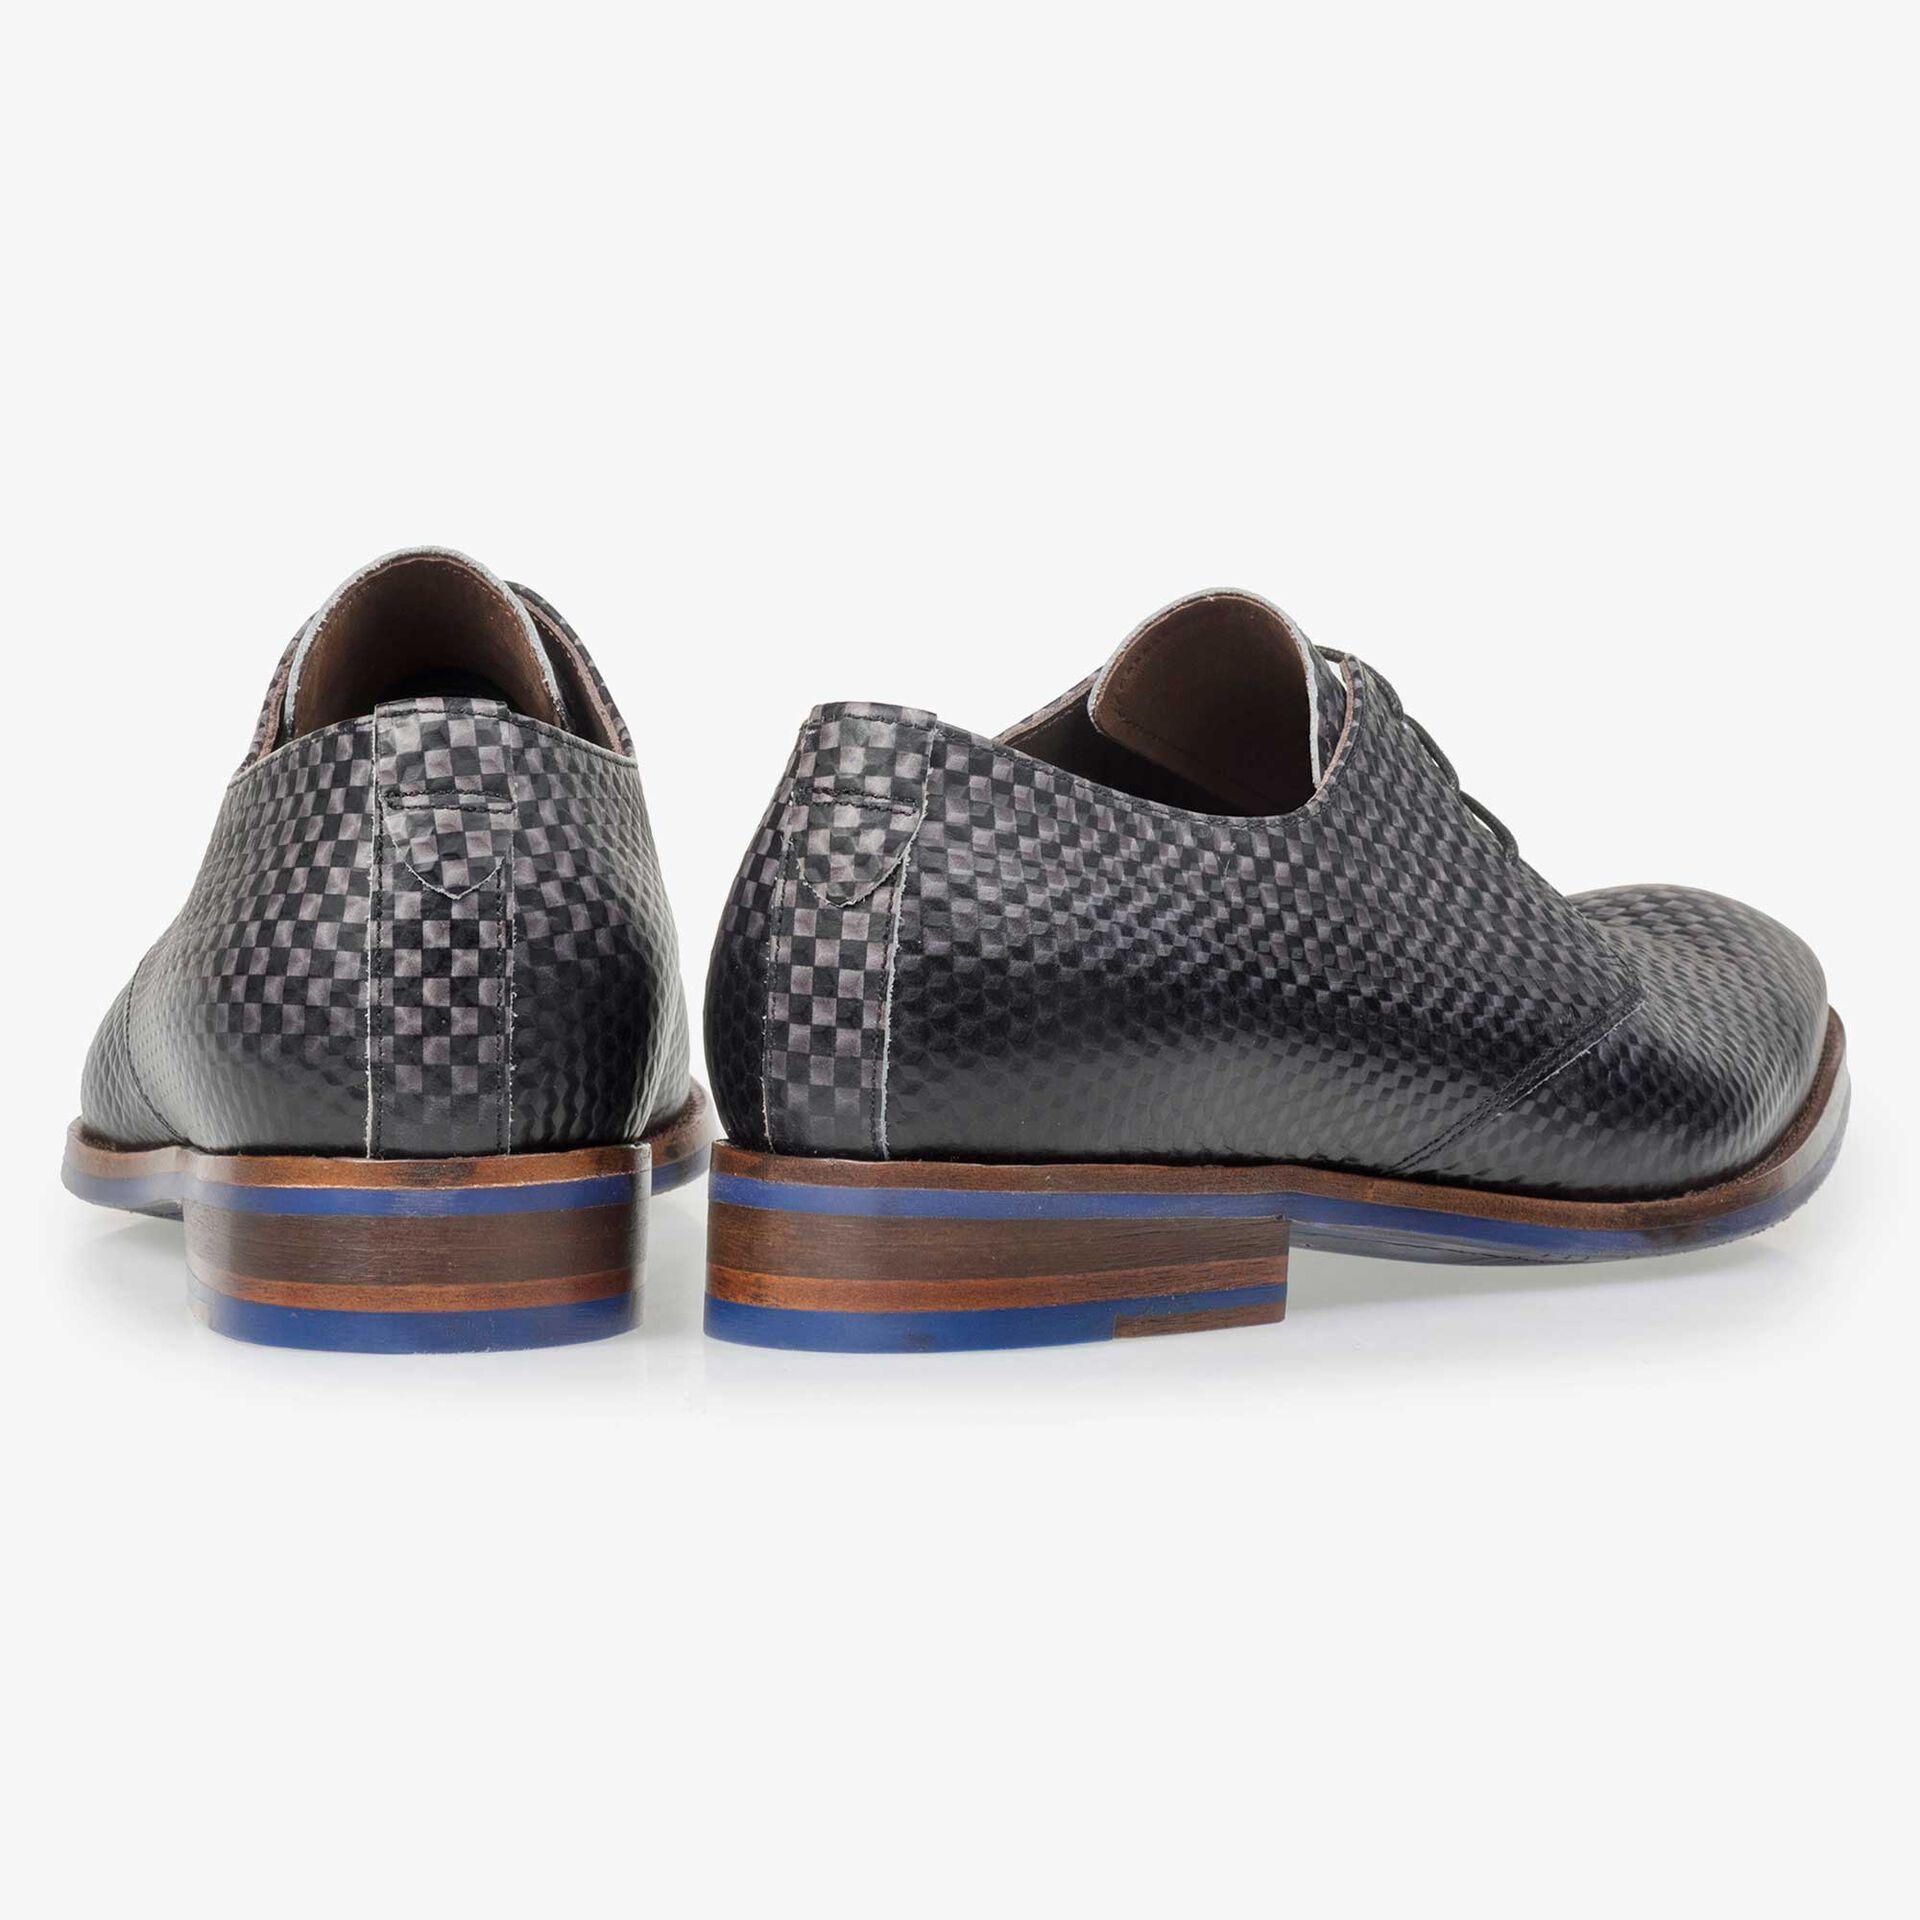 Floris van Bommel men's dark grey leather lace shoe